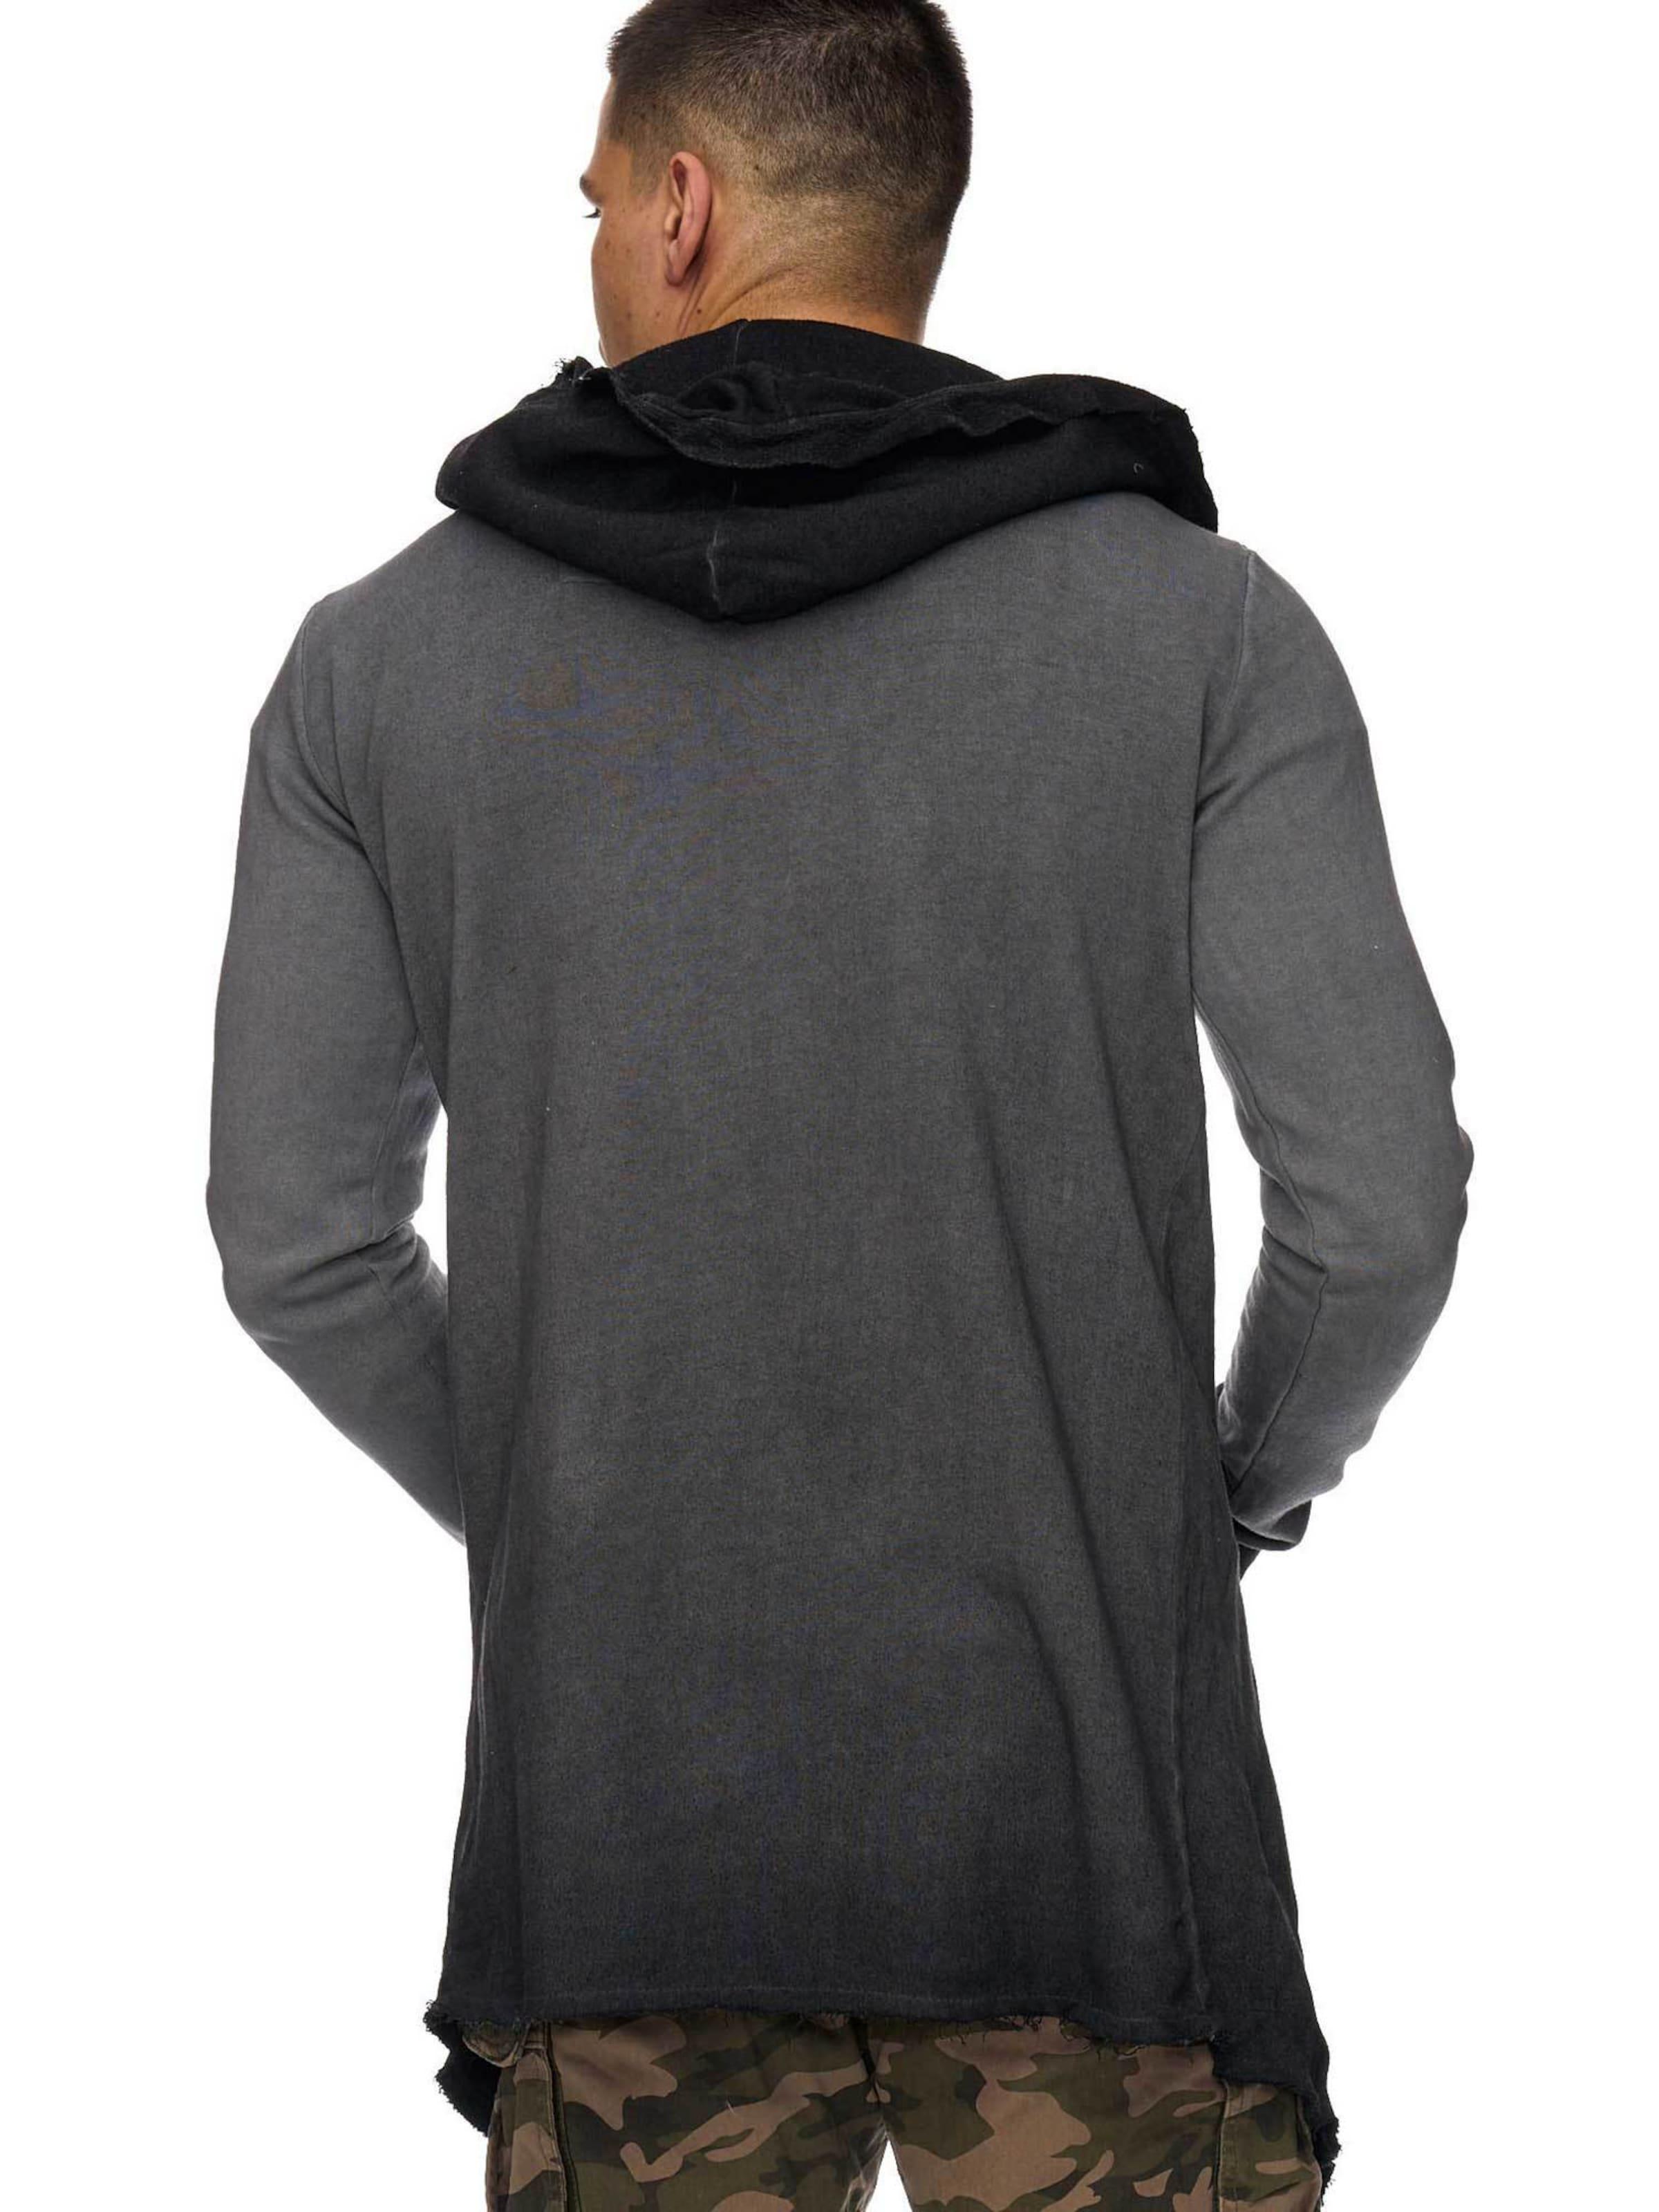 INDICODE JEANS Sweatjacke ' Oversize Sweatjacke ' 100% Original Manchester Große Online-Verkauf IMHS6SHi